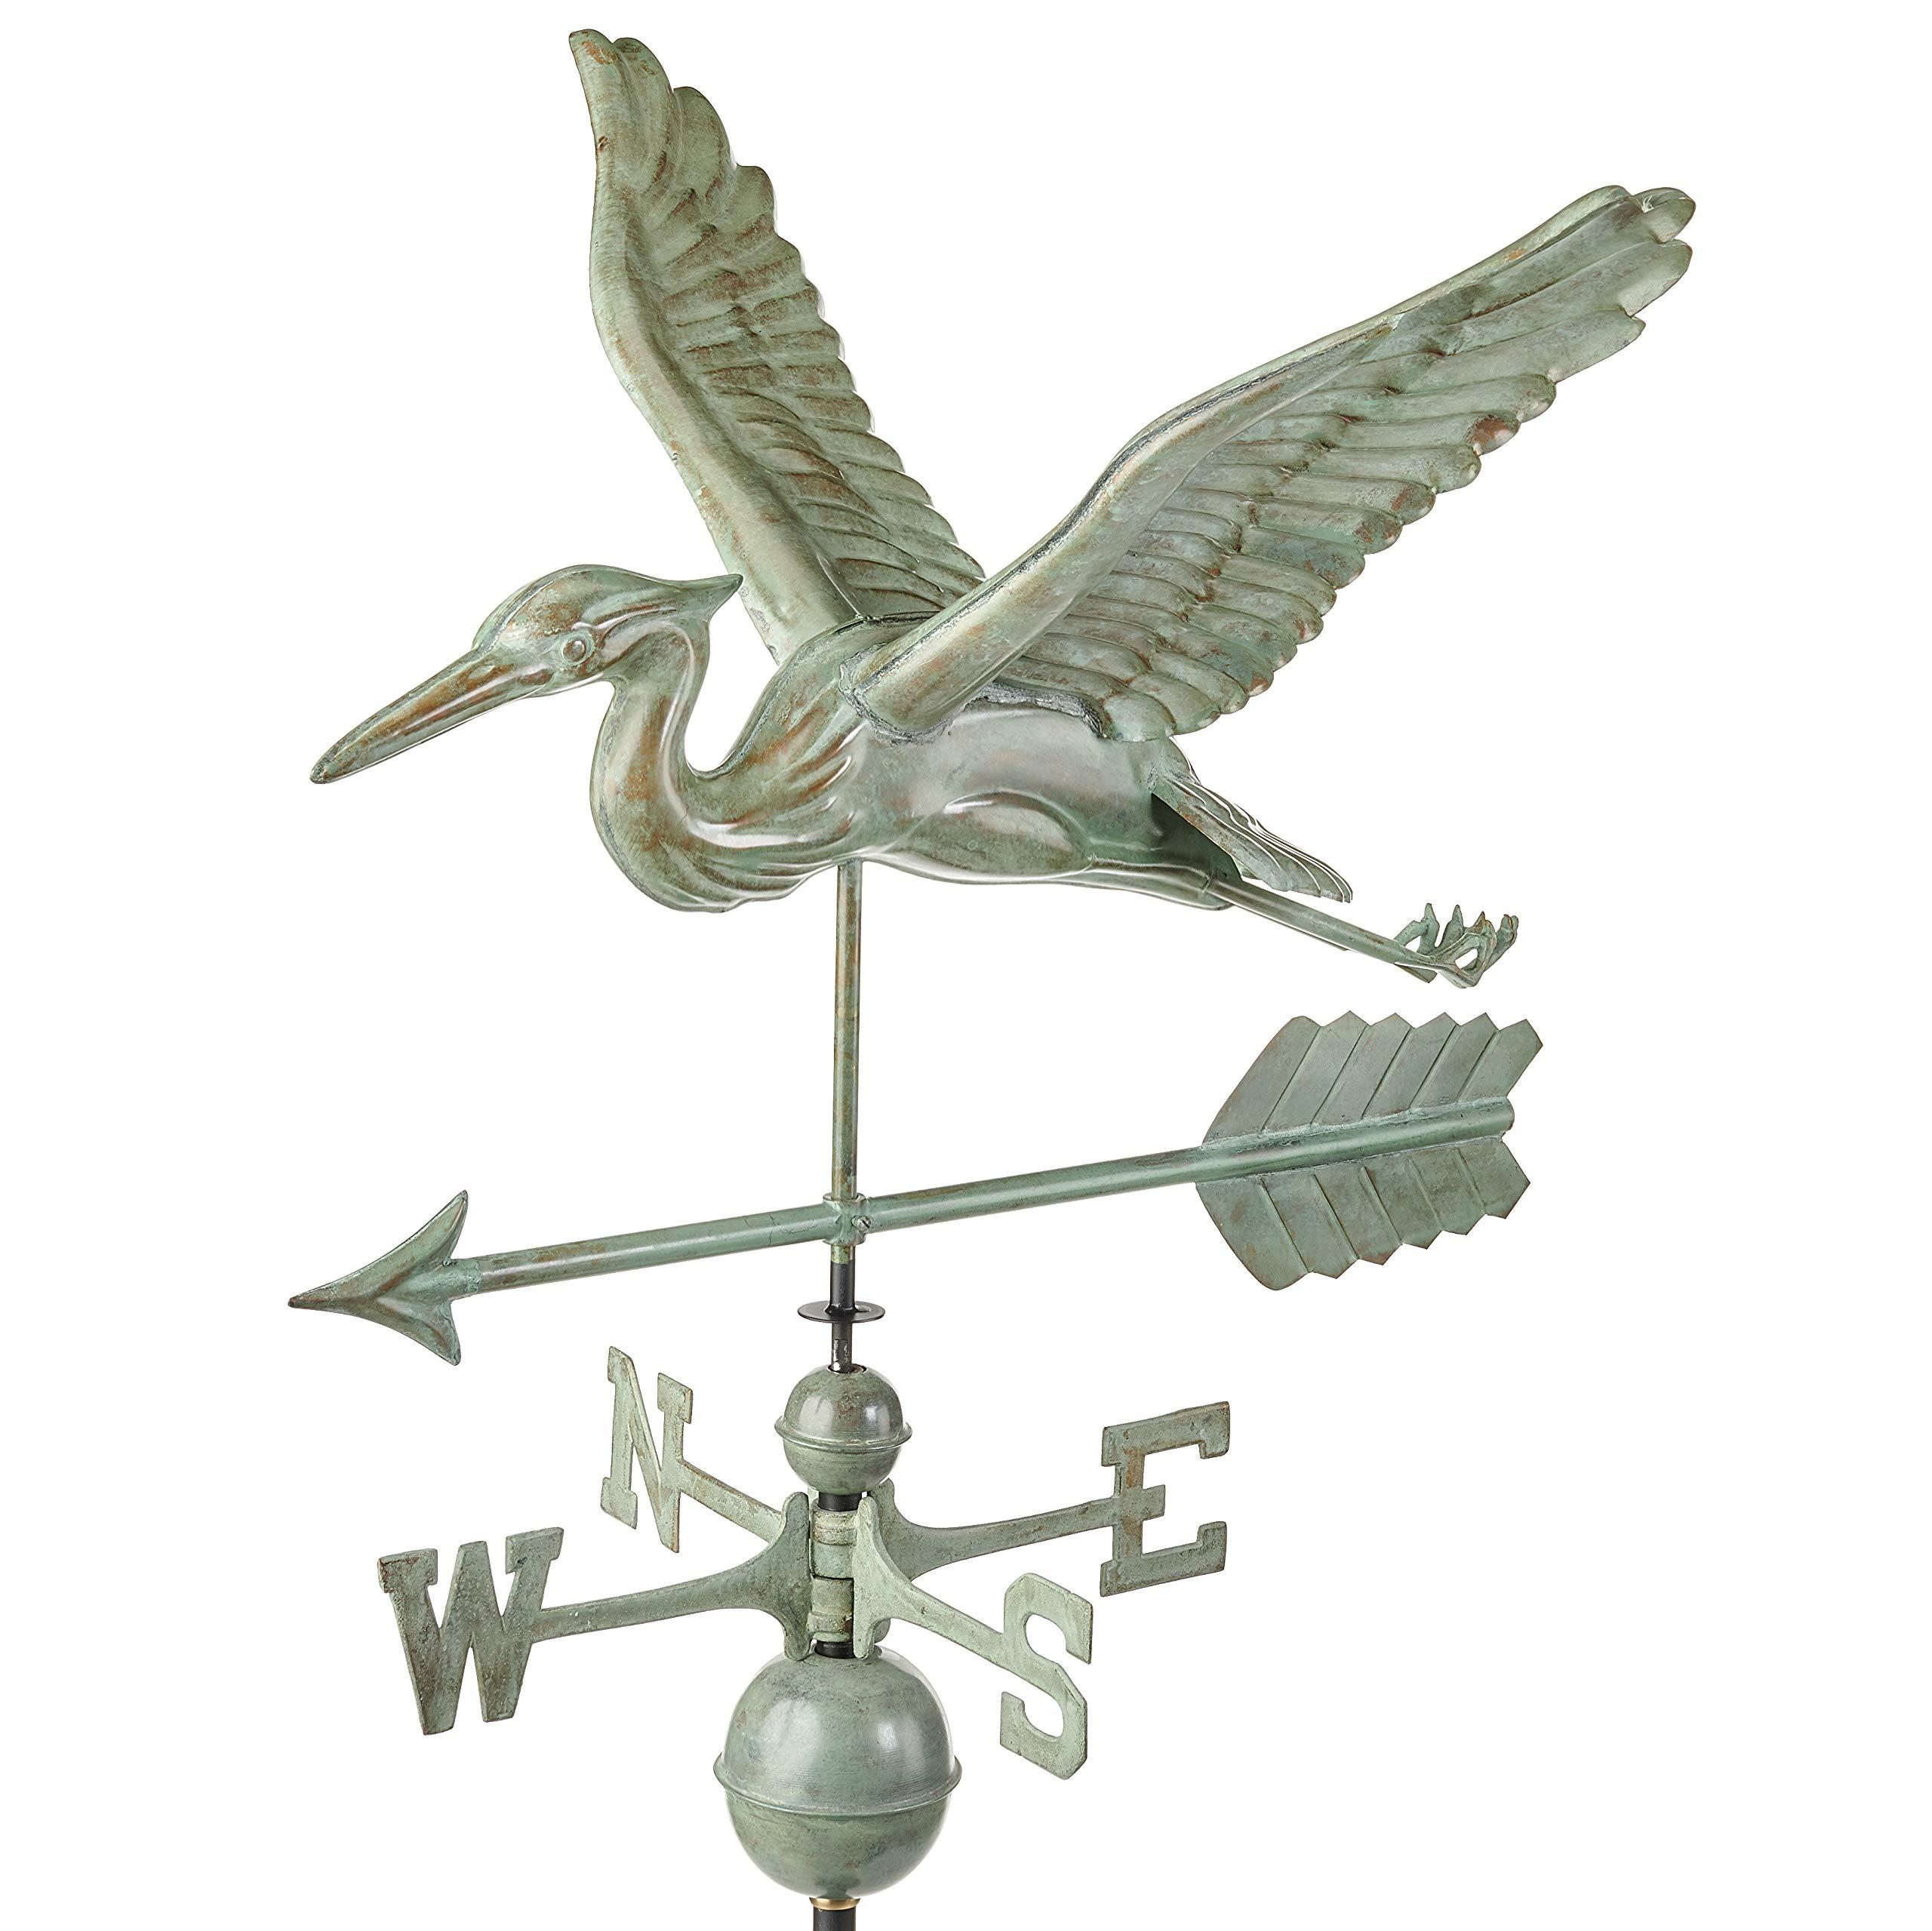 Good Directions, Inc. 9606V1A Blue Heron Arrow Weathervane, Verde